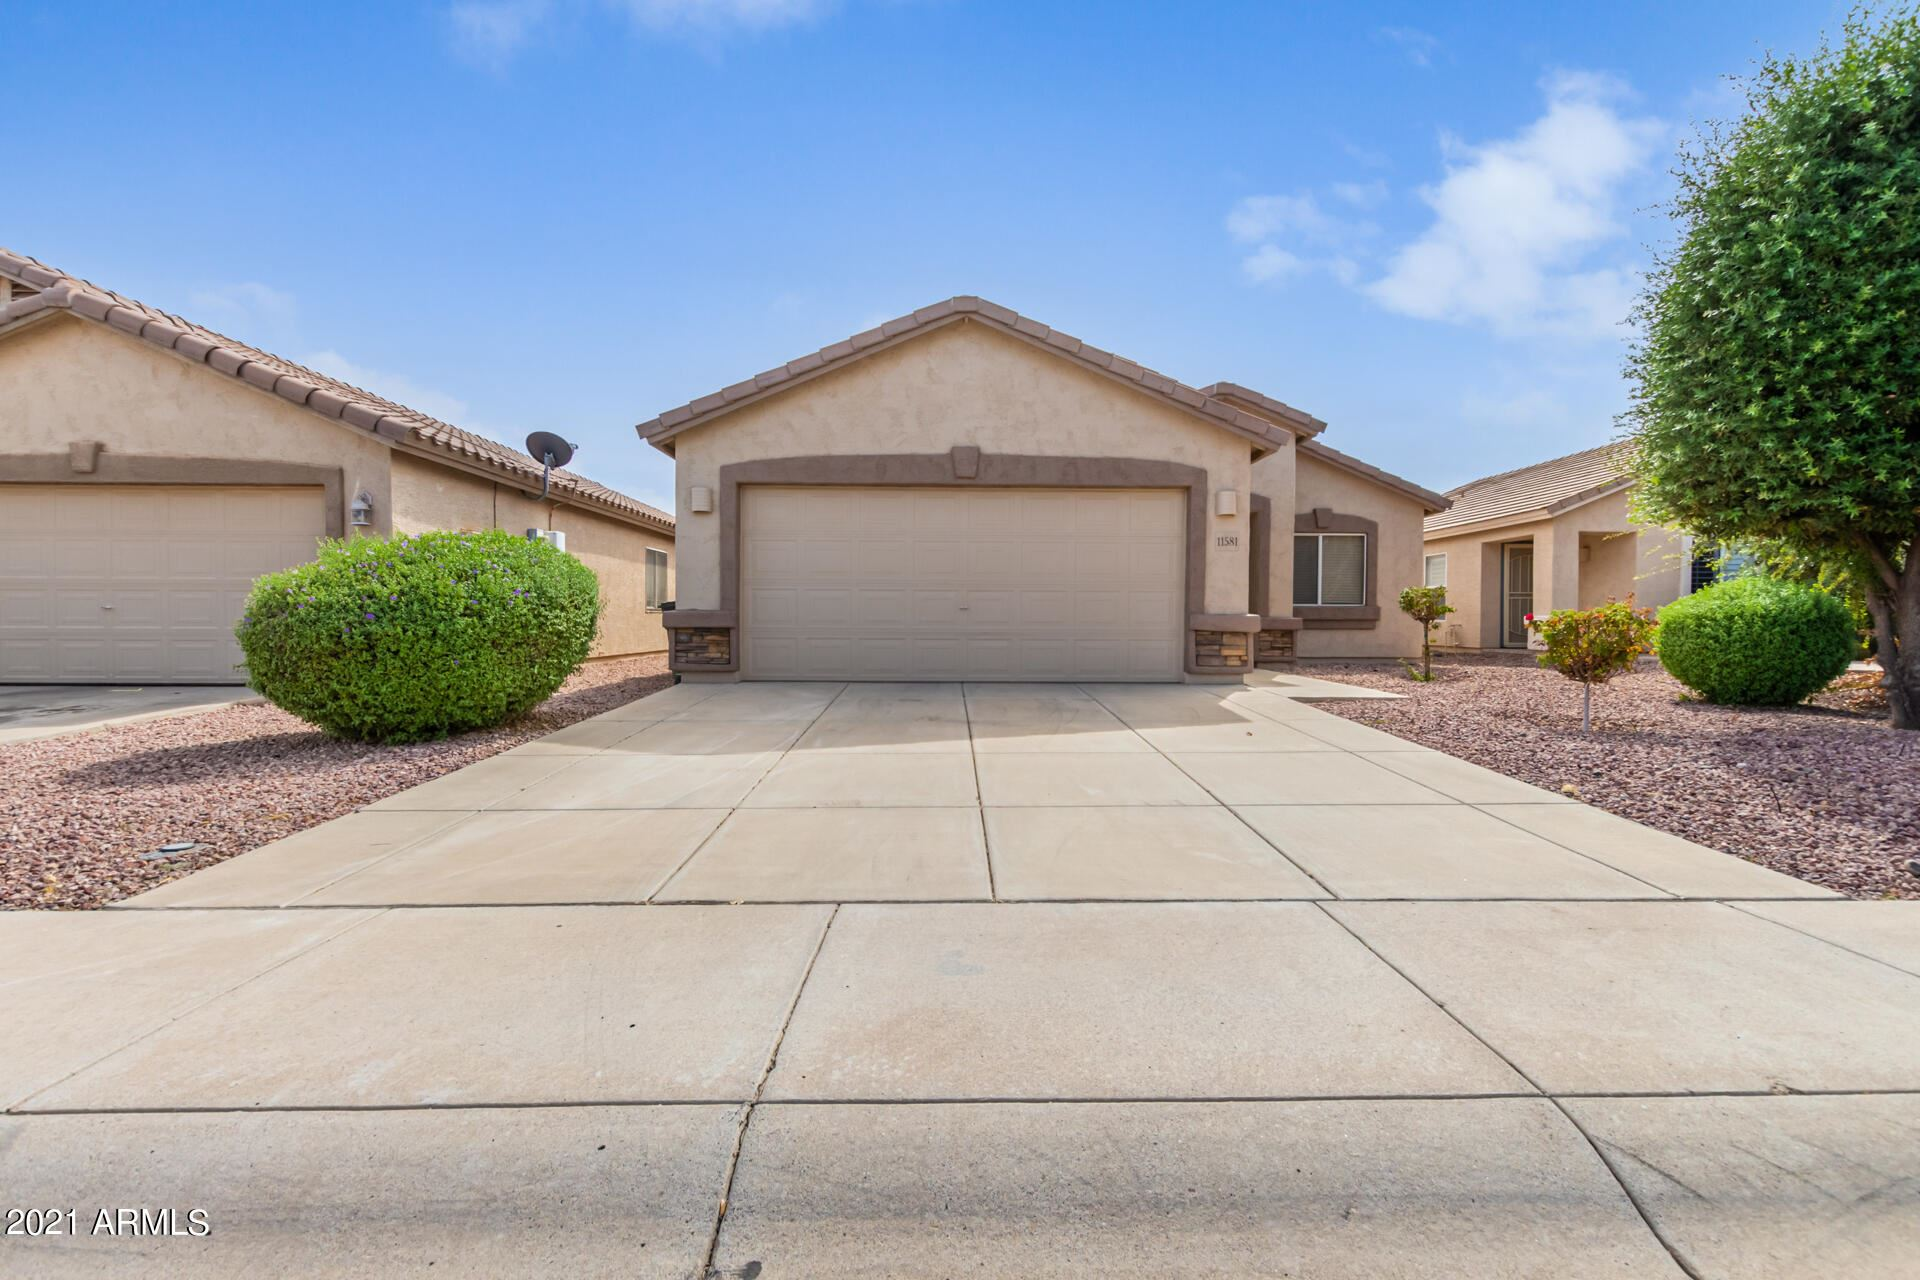 Photo of 11581 W RETHEFORD Road, Youngtown, AZ 85363 (MLS # 6304982)